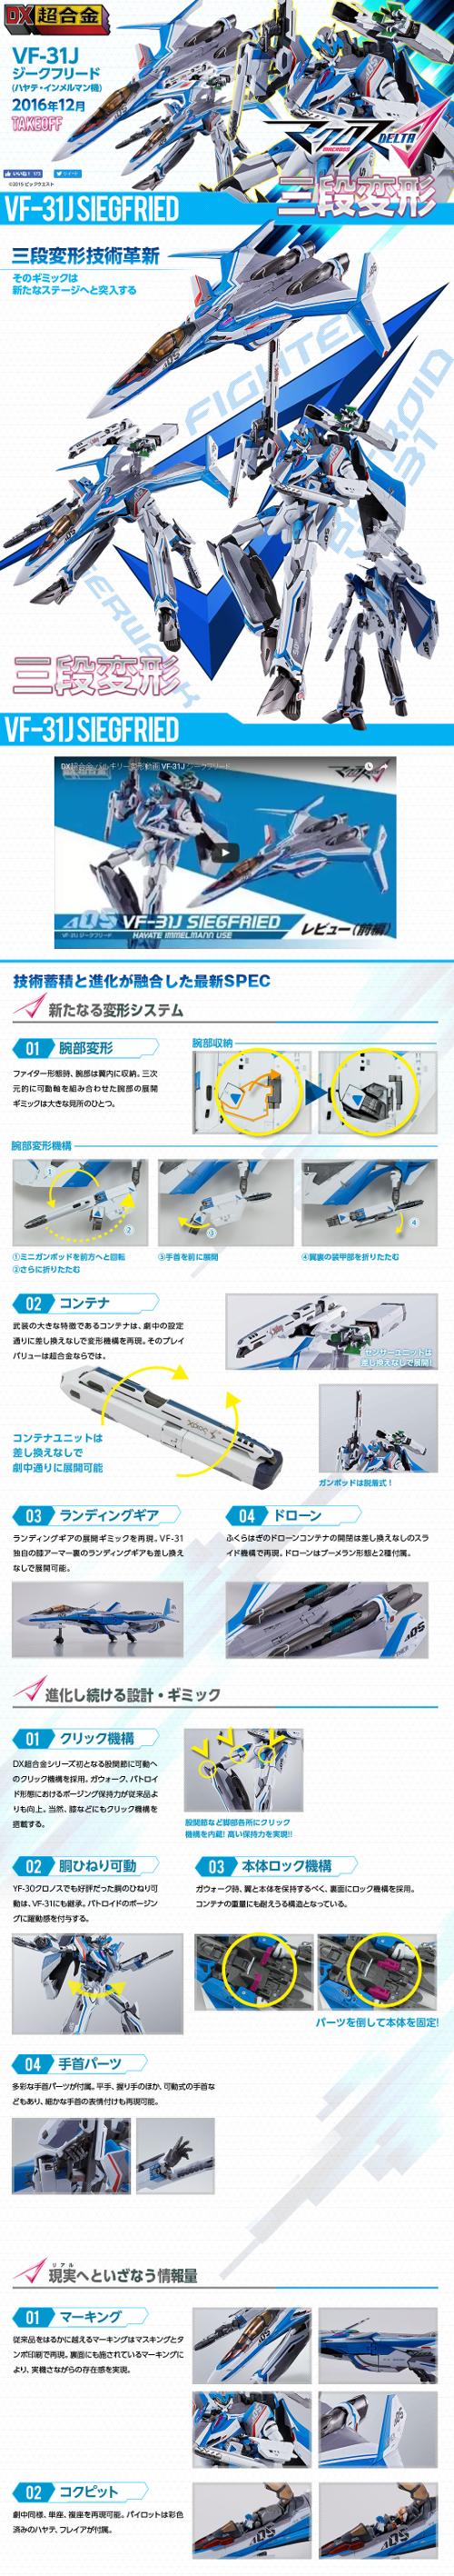 FireShot Capture 31 - DX超合金 VF-31Jジークフリード(ハヤテ・インメルマン機)ス